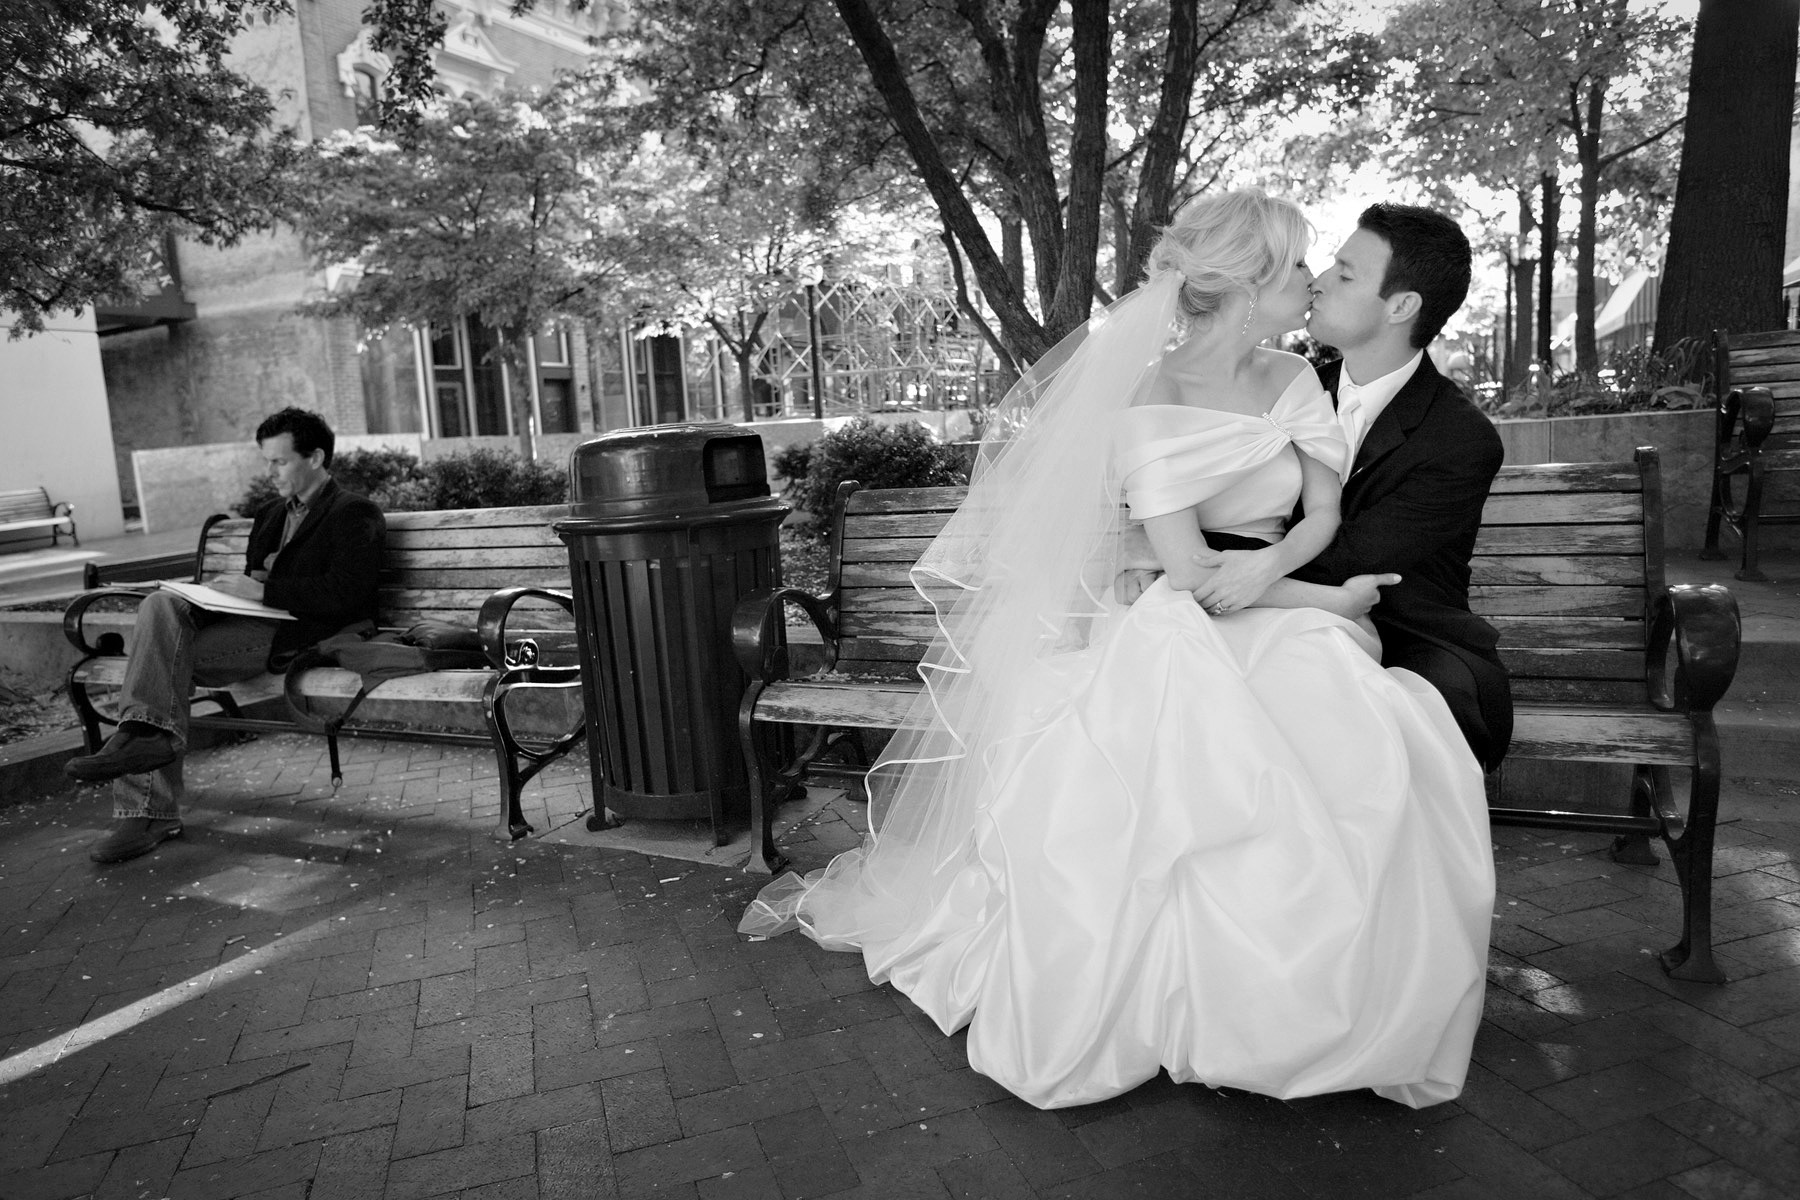 minnesota-wedding-photographers-mark-kegans-901.jpg